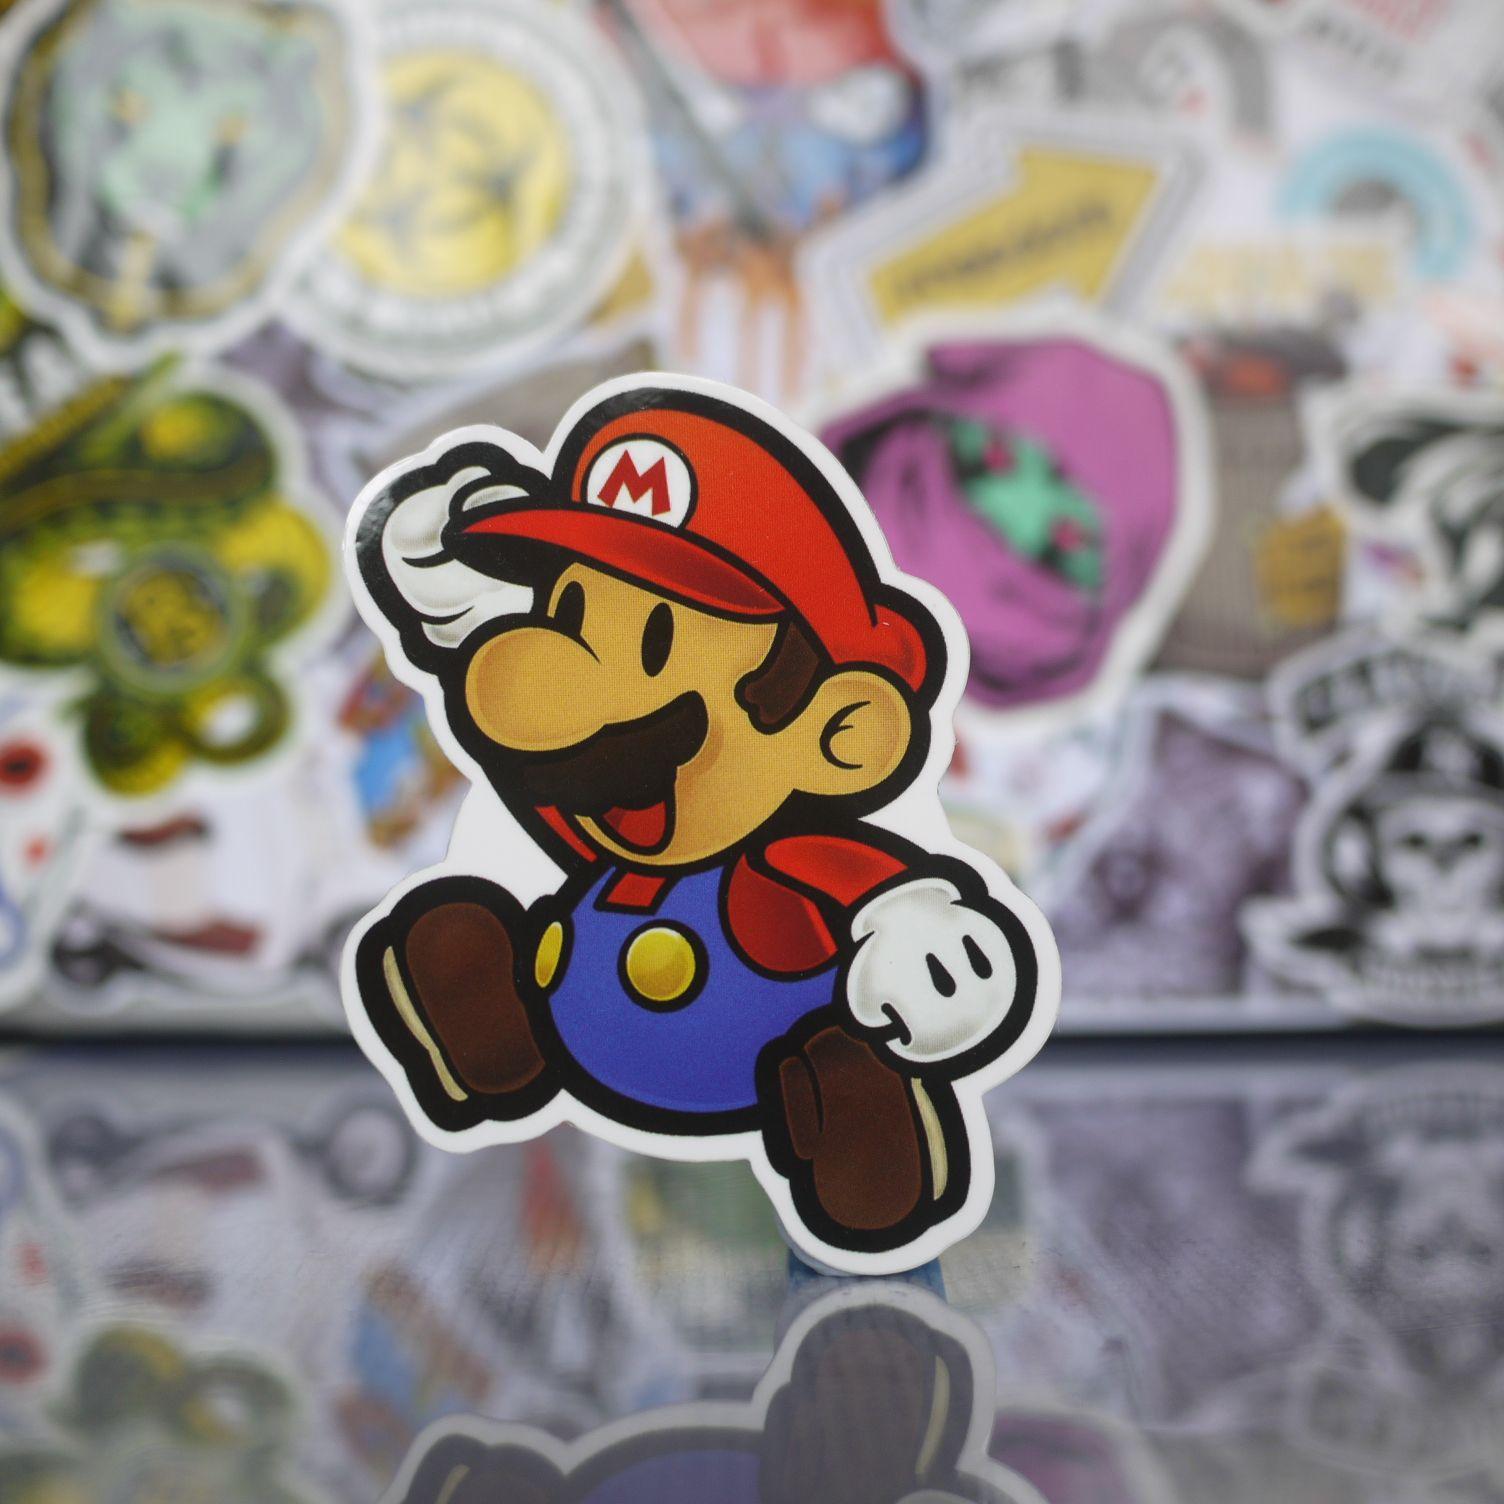 Super Mario Jumping Pose Sticker Jumping Poses 58ab16b5238